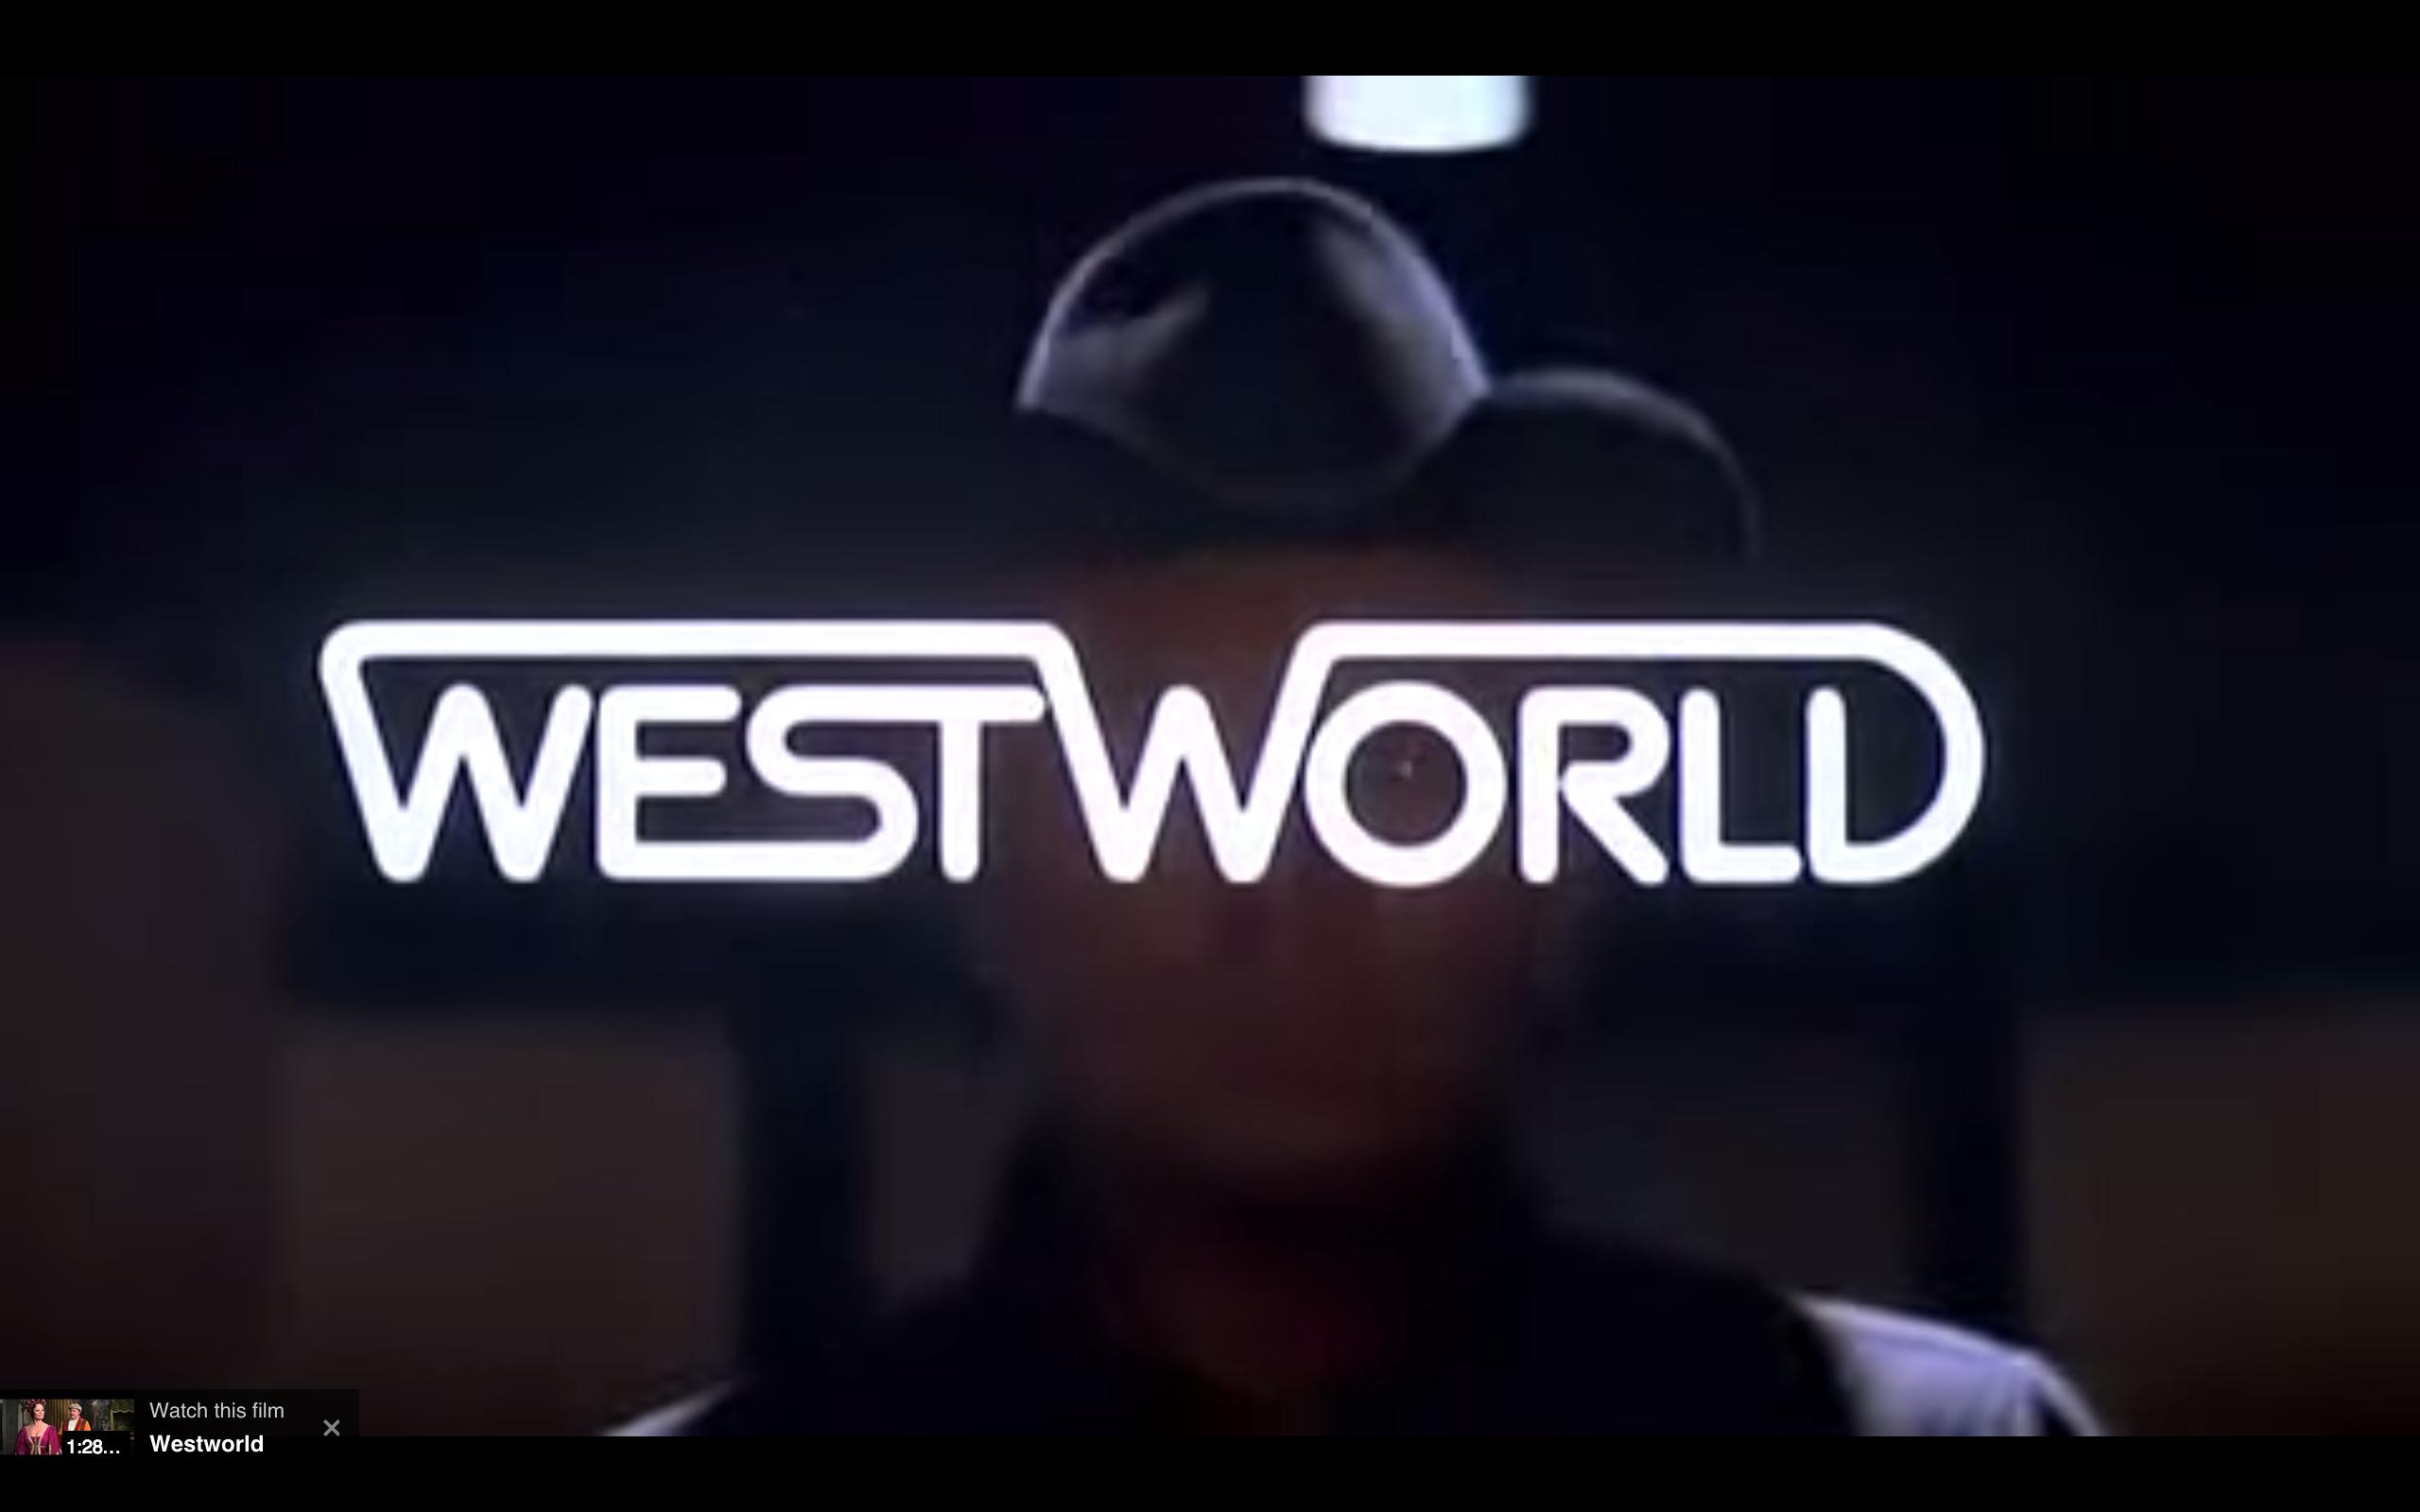 Westworld Westworld Company Logo Tech Company Logos